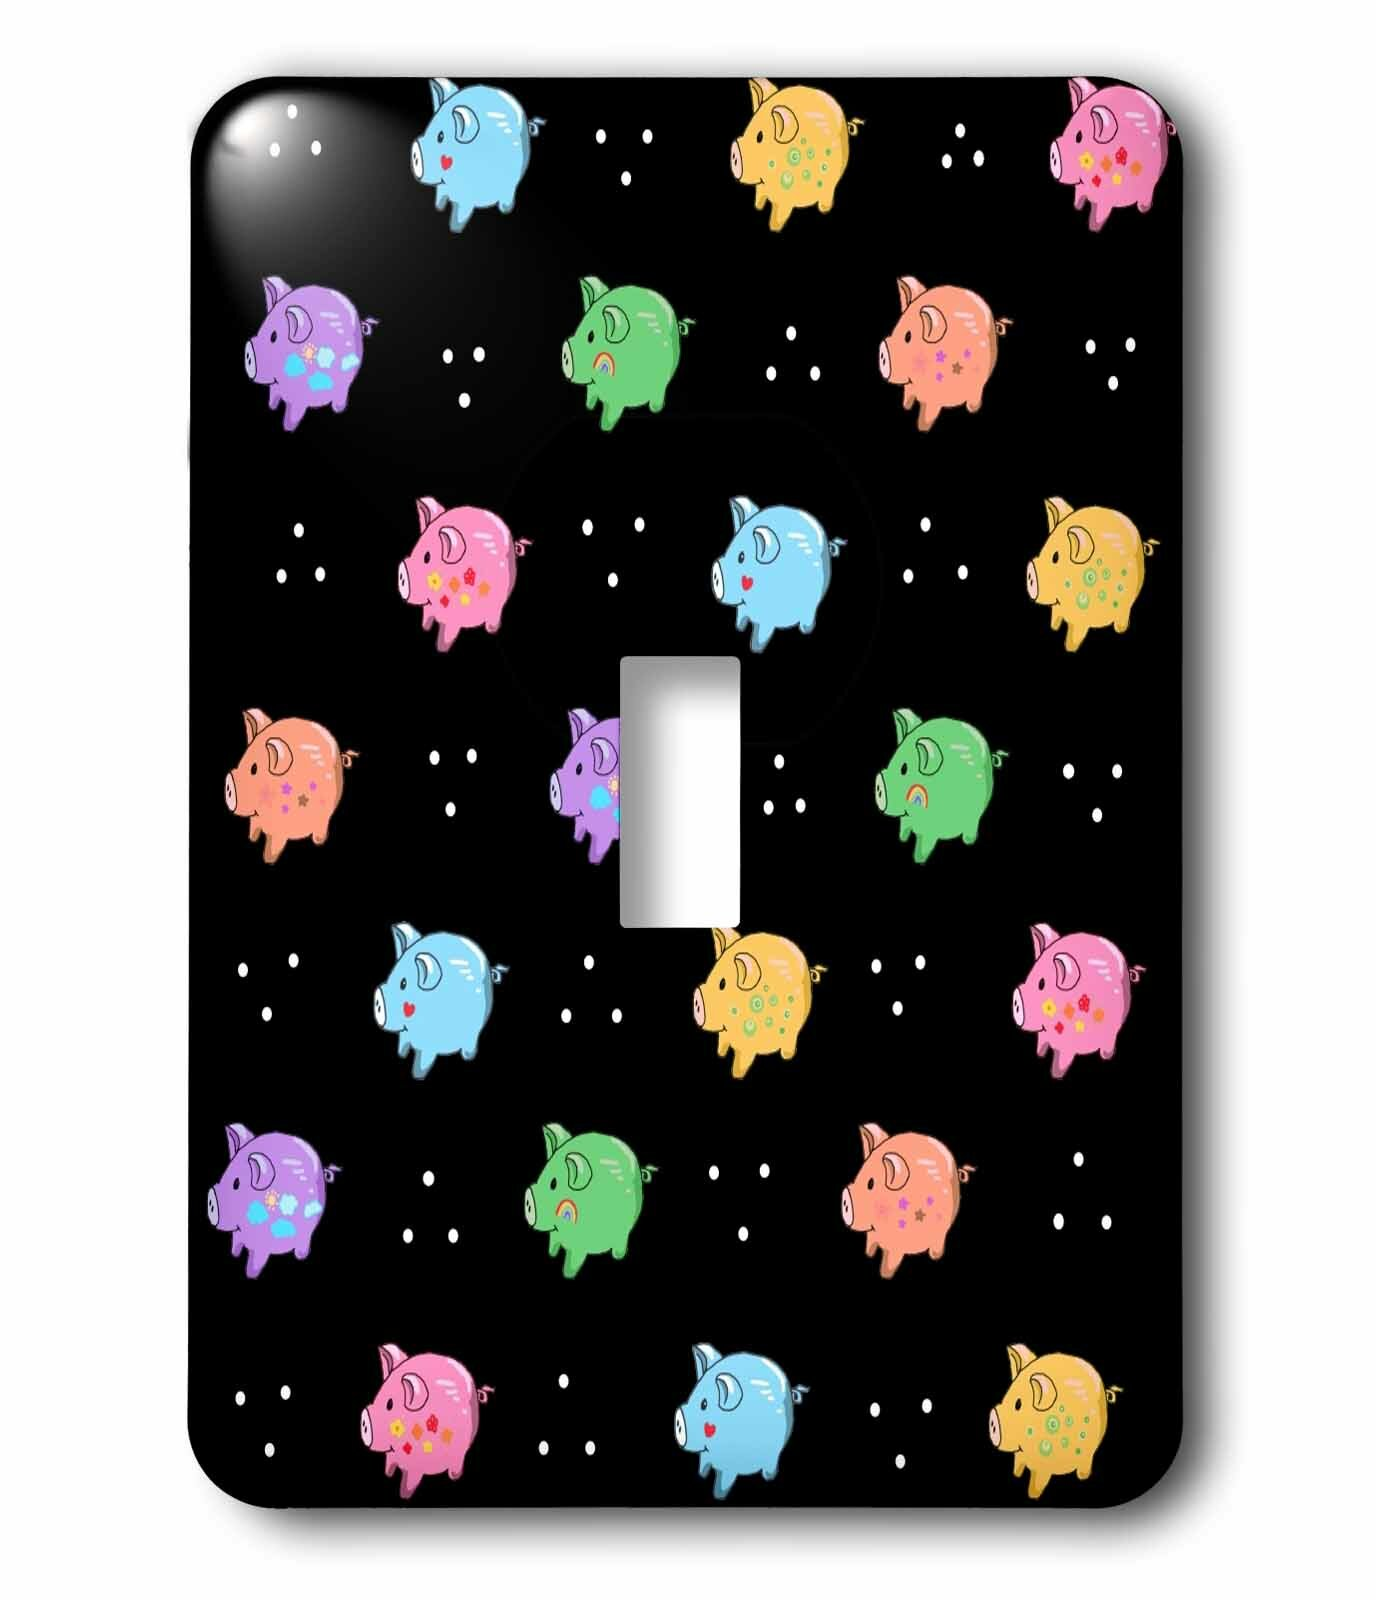 3drose Rainbow Pig Cartoon Cute Pigs Cartoony Anime Style On Black 1 Gang Toggle Light Switch Wall Plate Wayfair